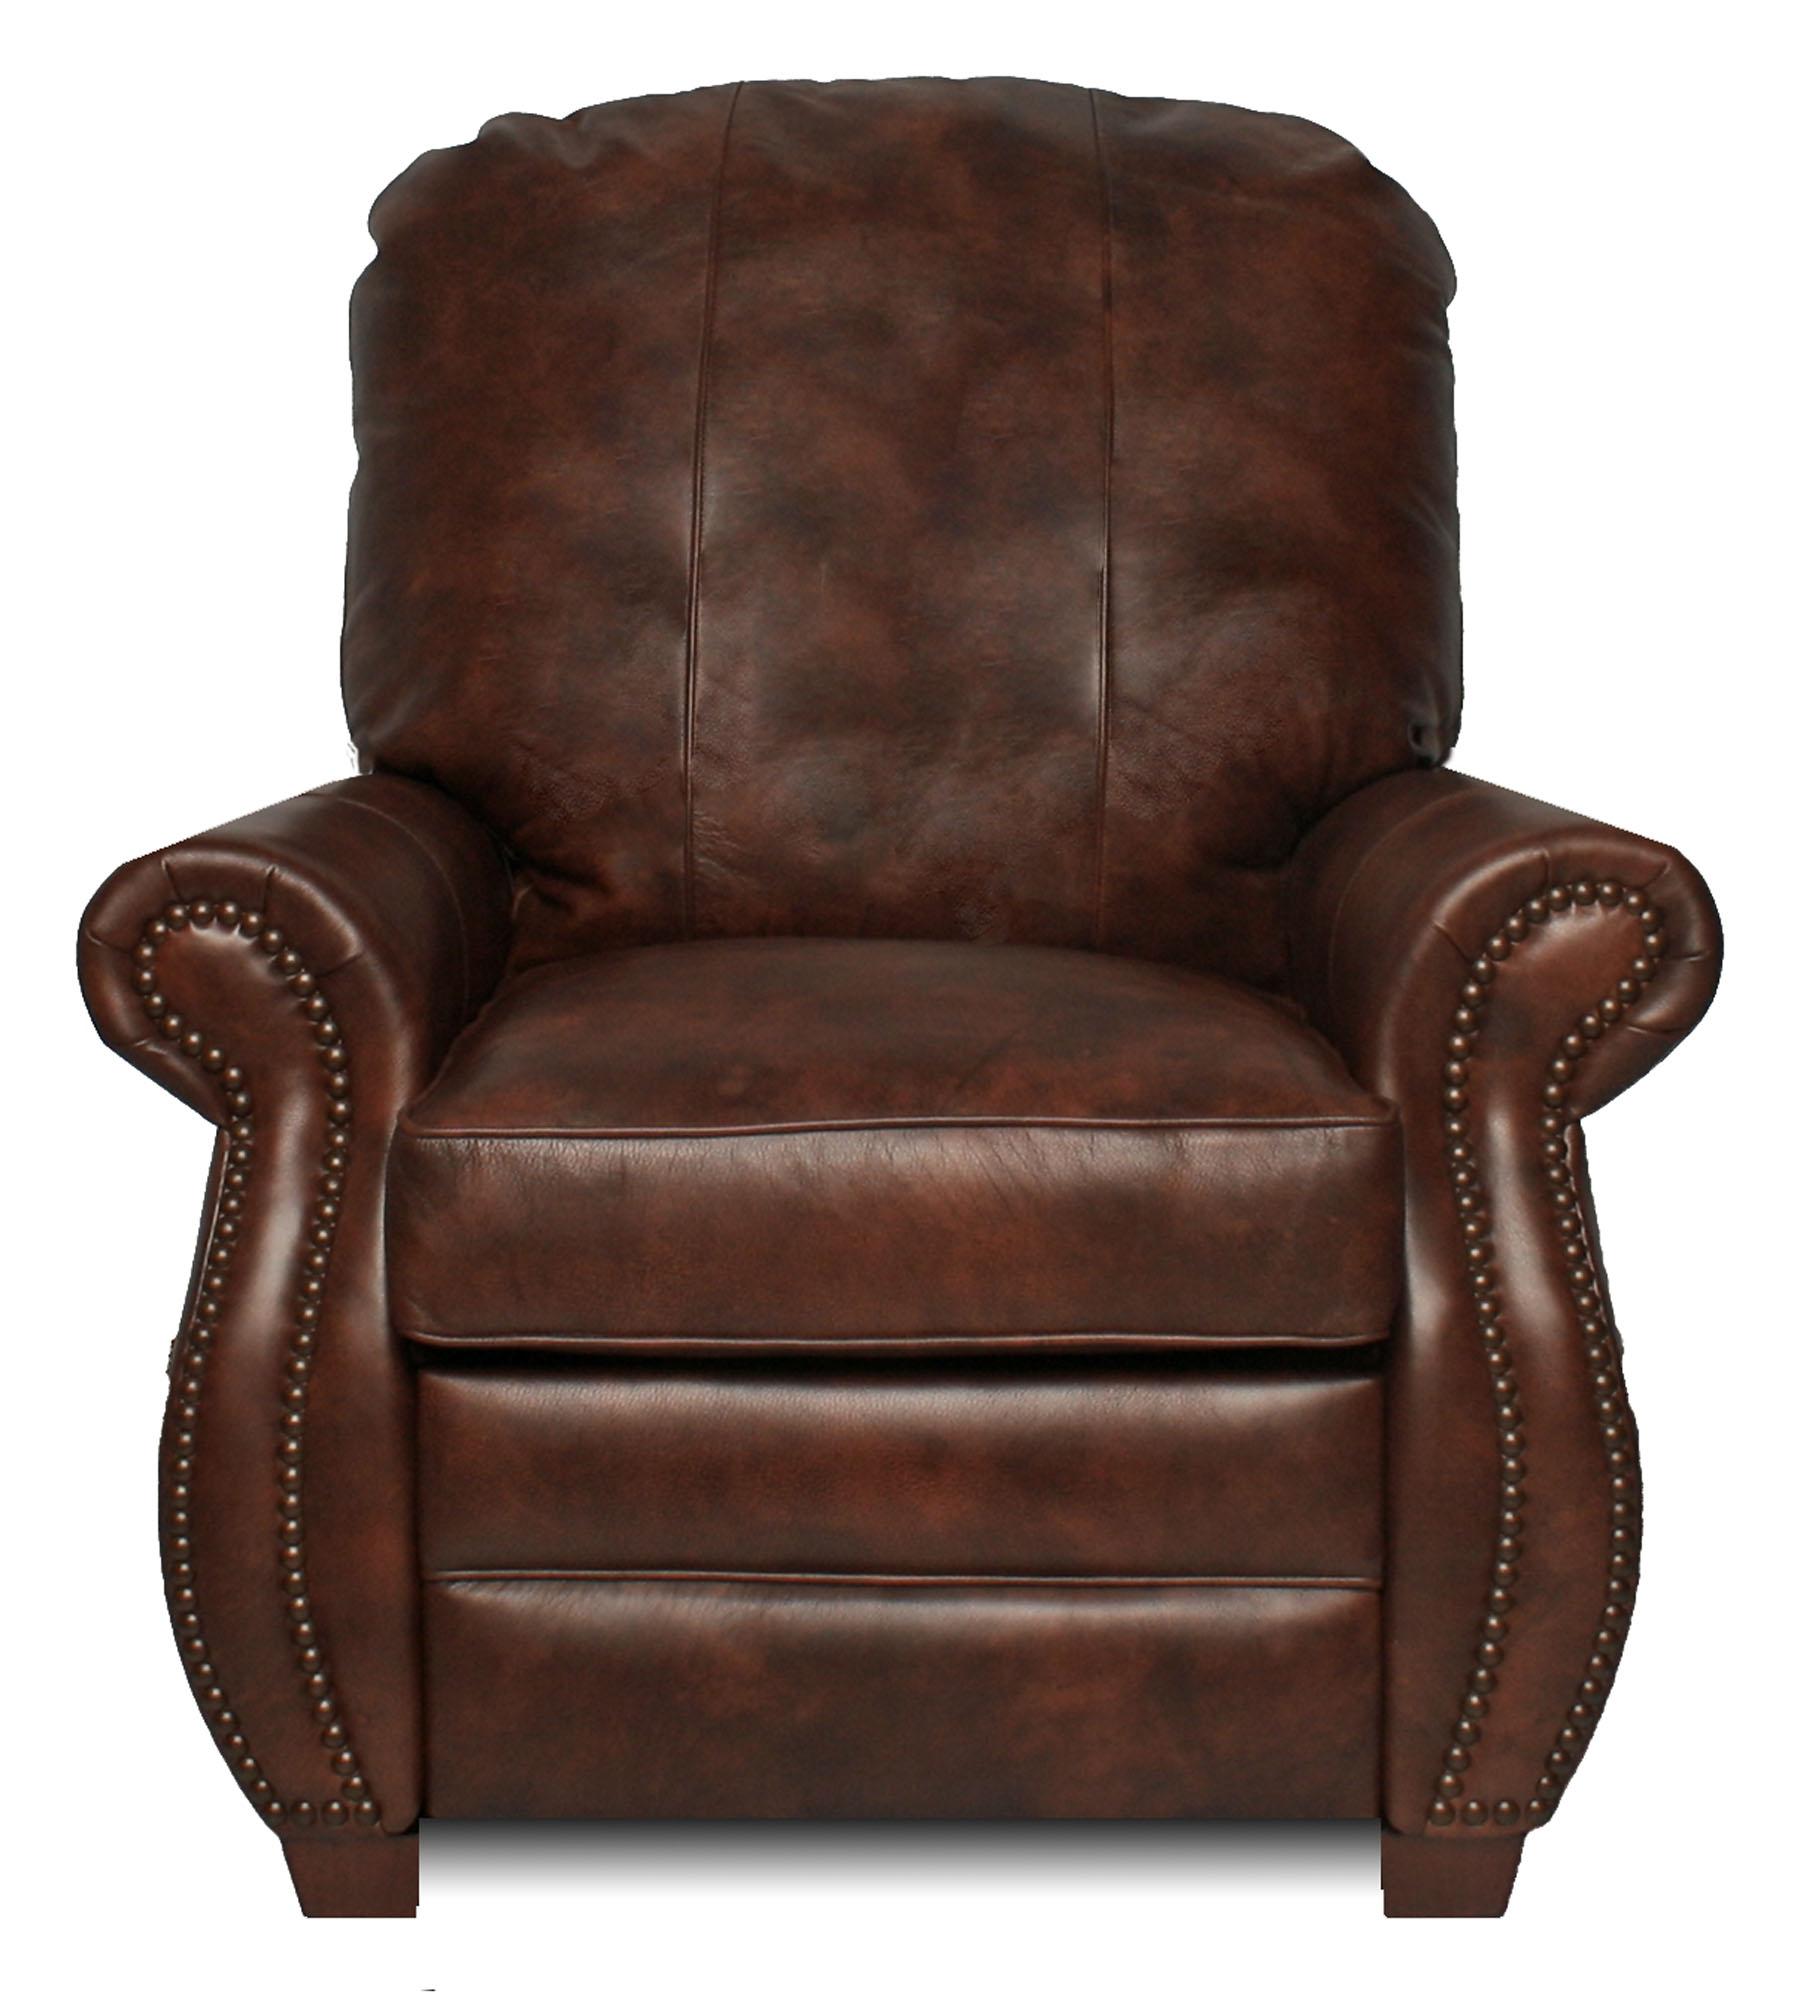 leather sofa phoenix arizona cama individual reclining home the honoroak